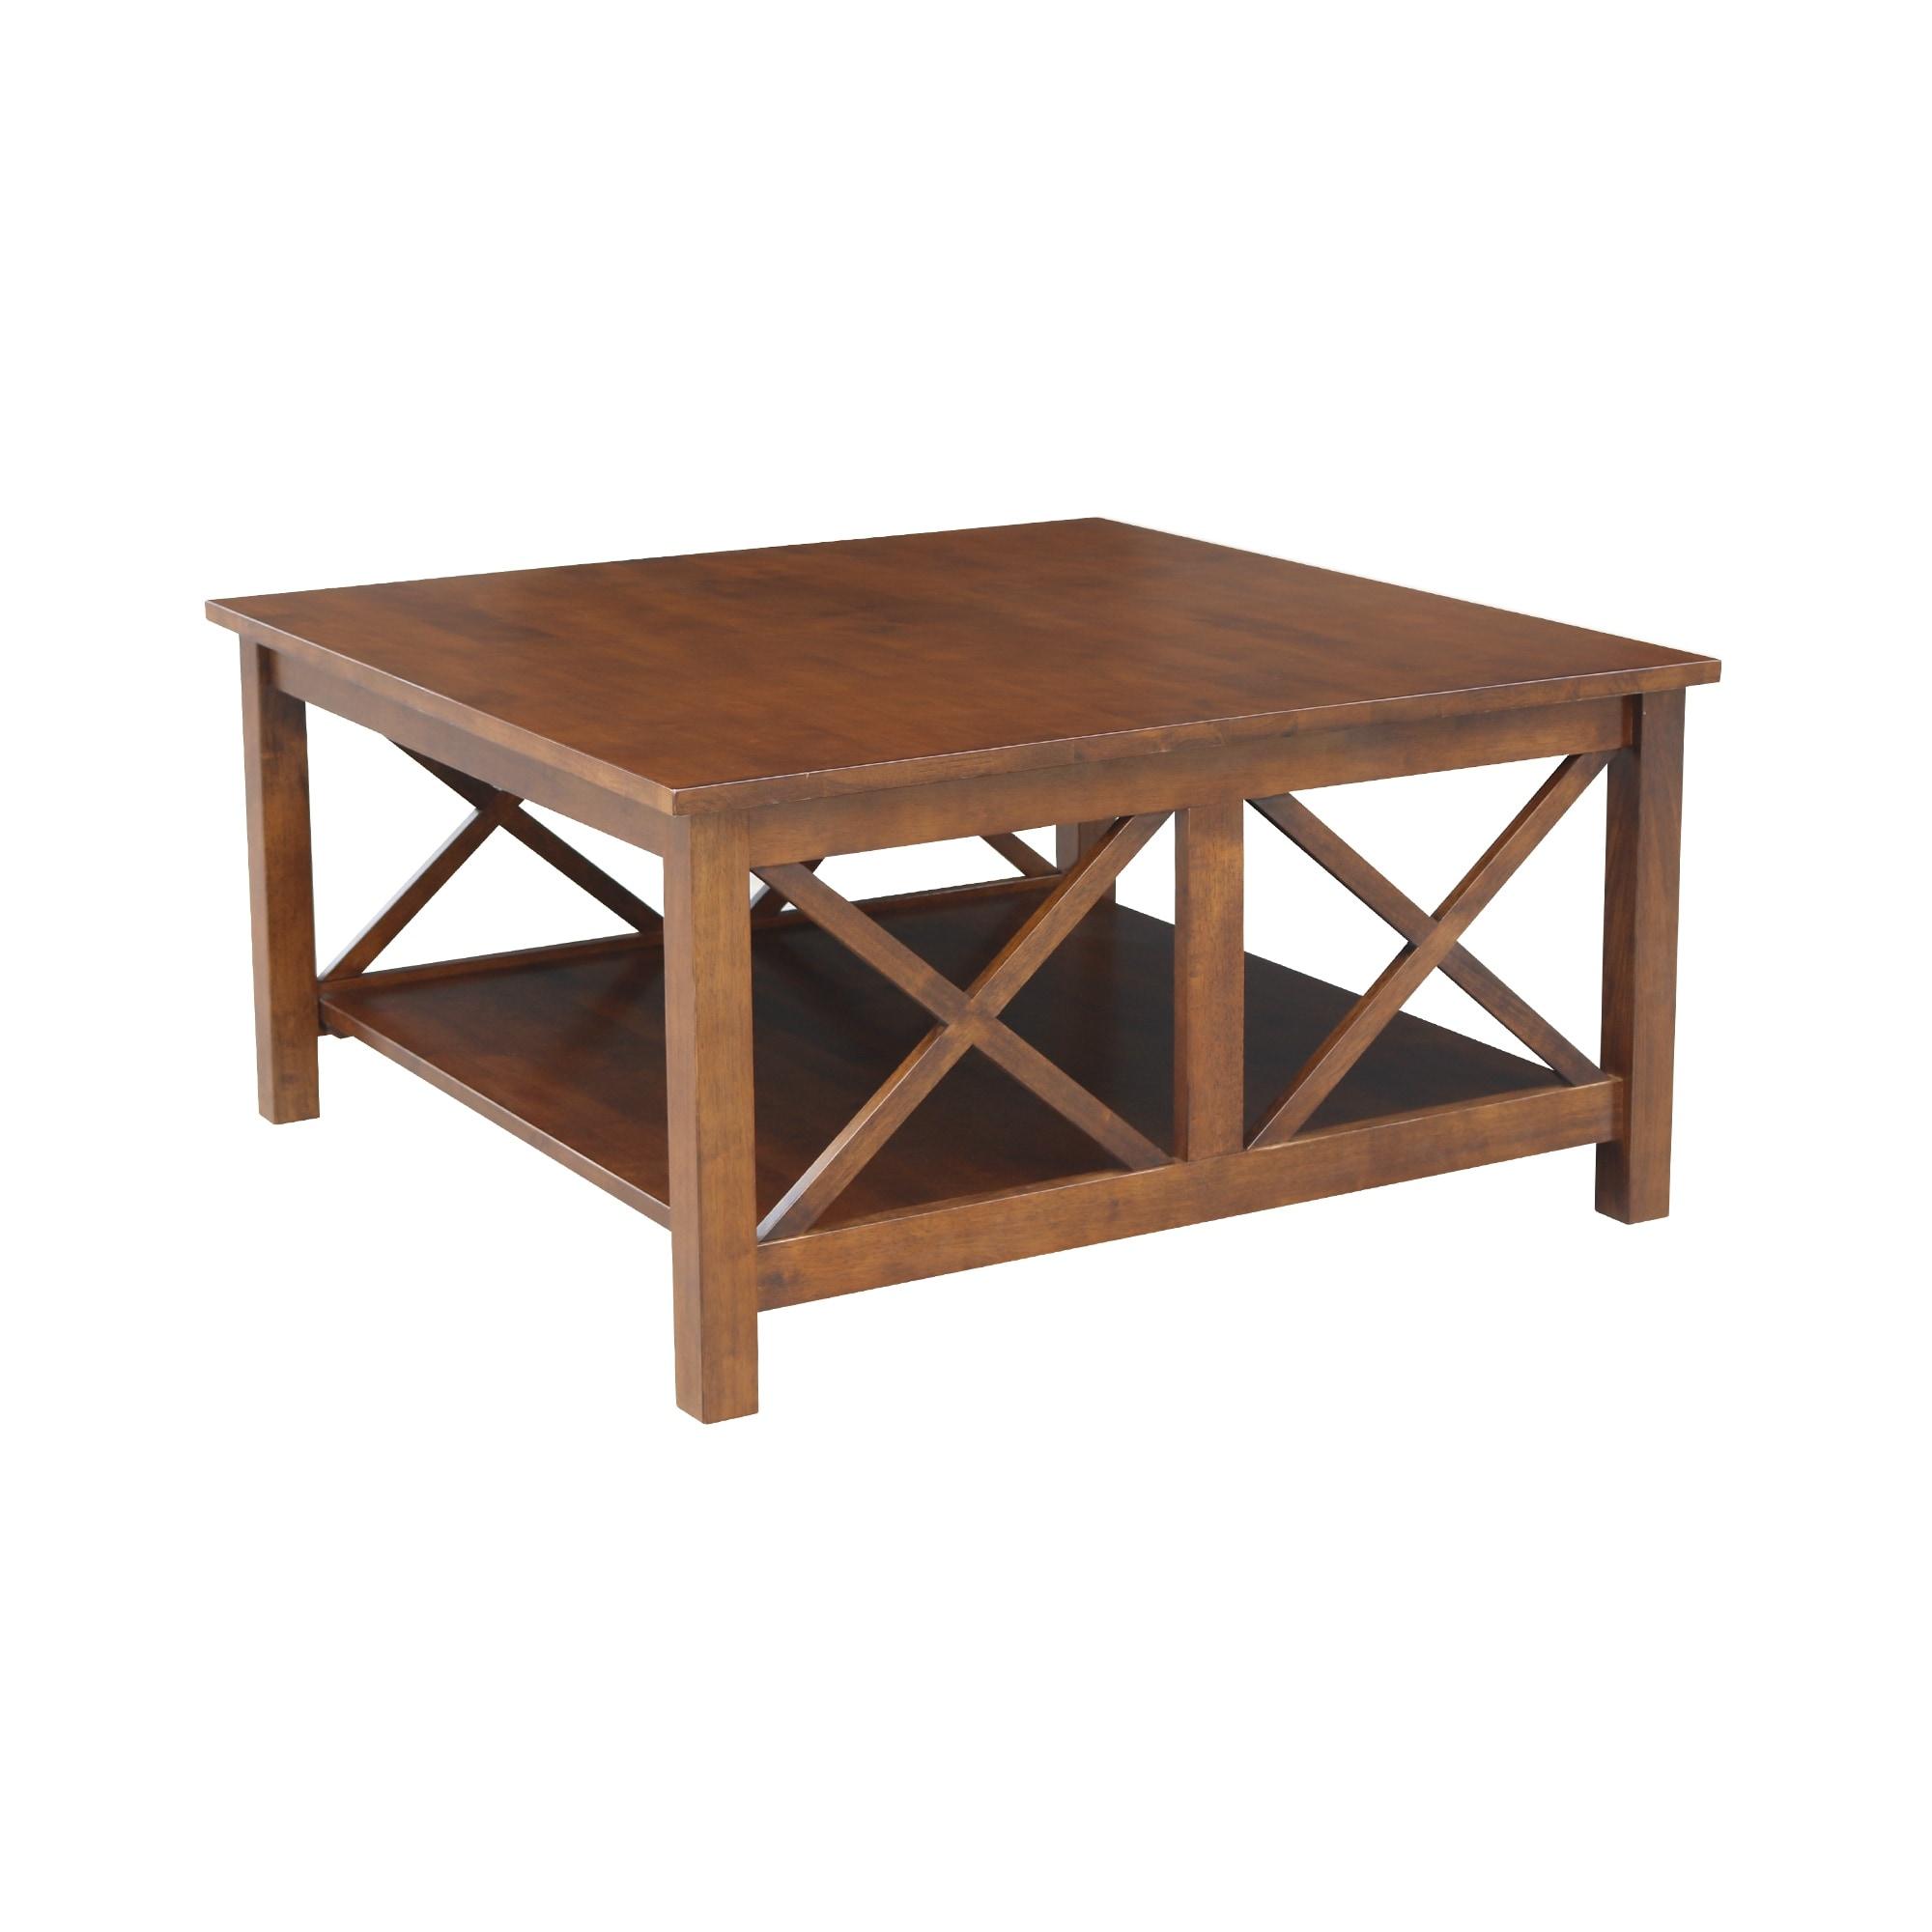 Hampton Solid Hardwood Square Coffee Table 36 X 36 36 X 36 On Sale Overstock 9330439